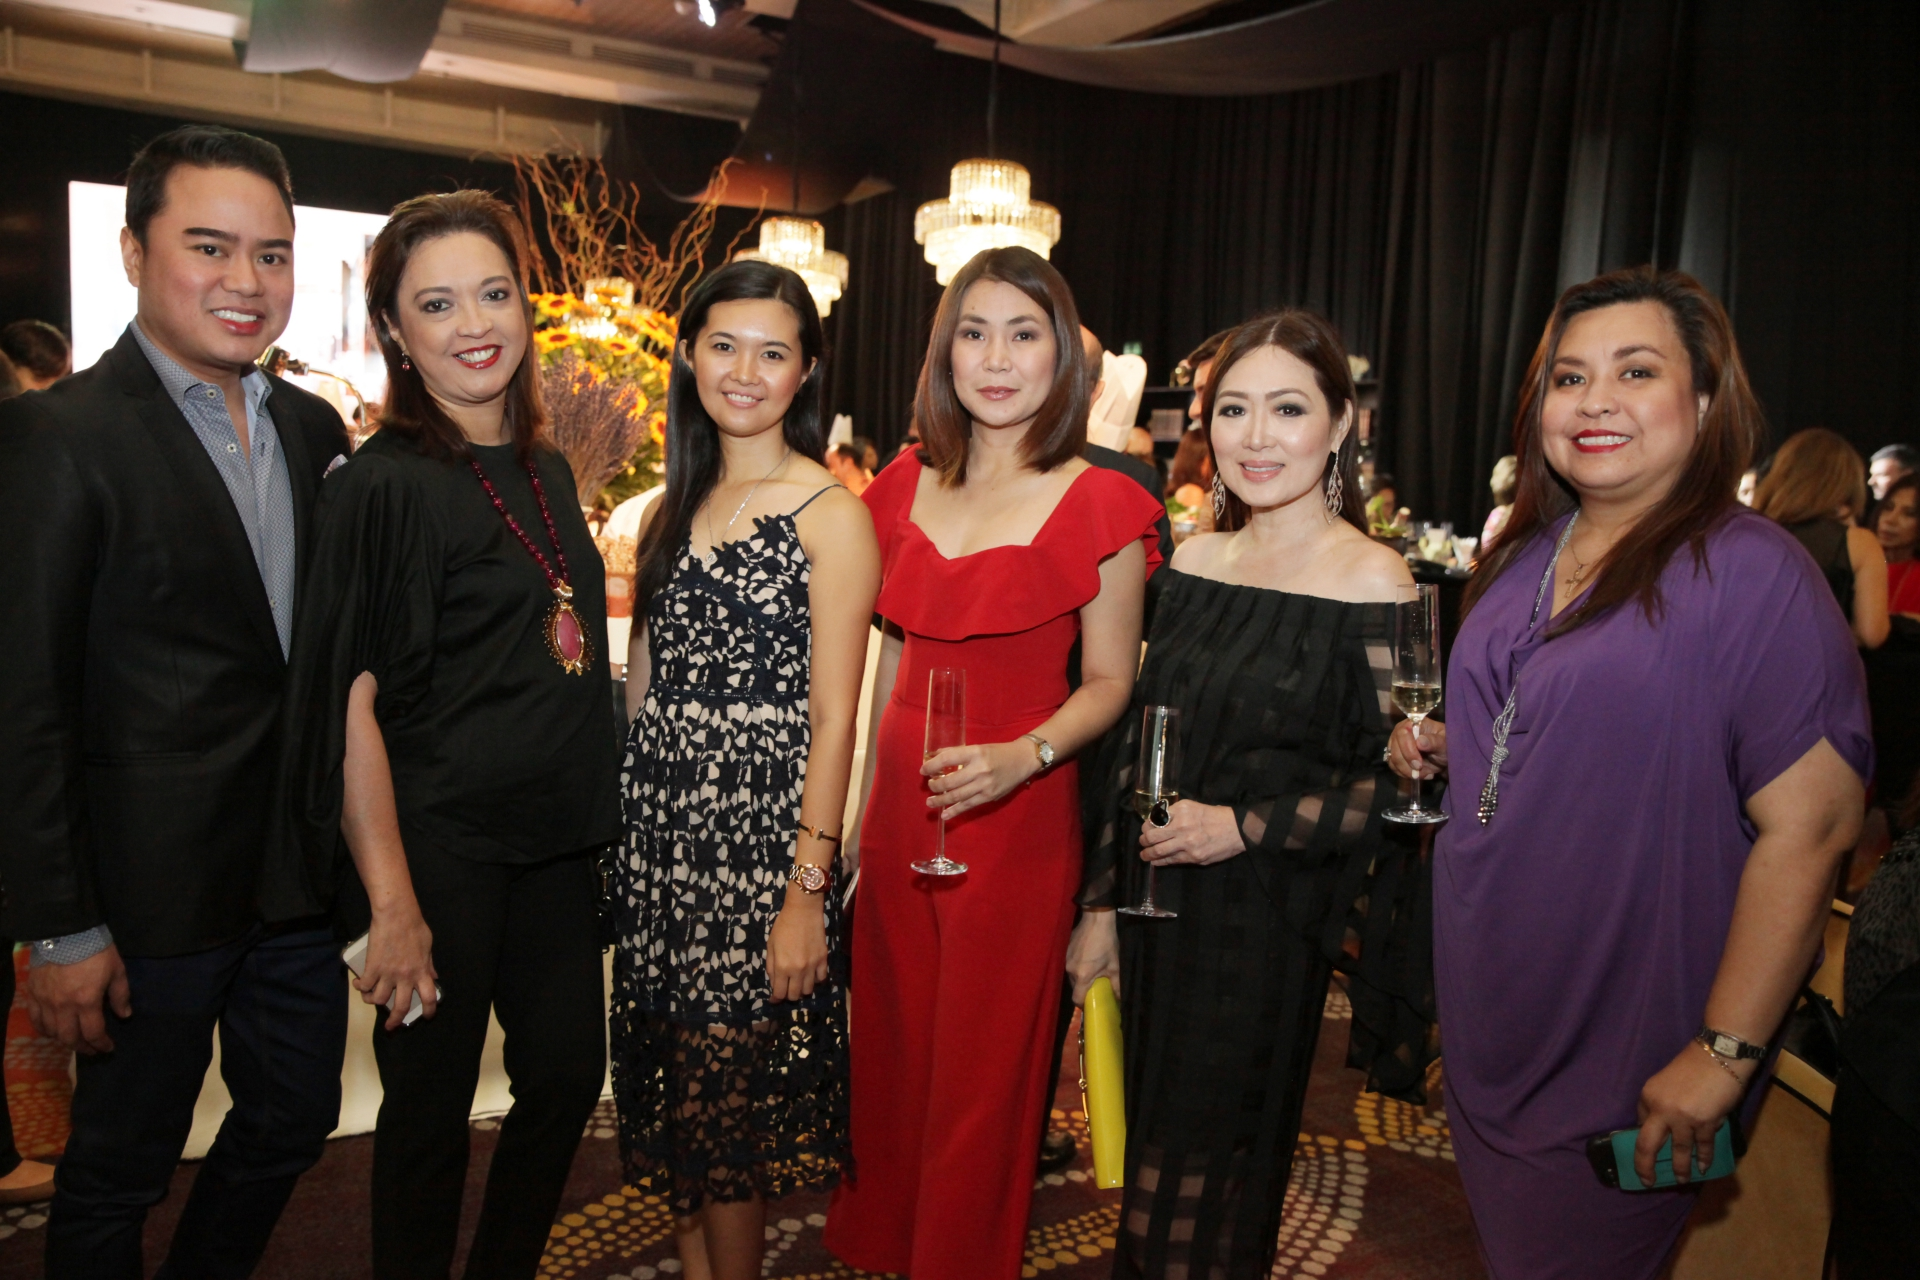 Francis de Leon, Carmela Bocanegra, Mia Sy, Ronie Reyes, Linda Ley and Liza Morales